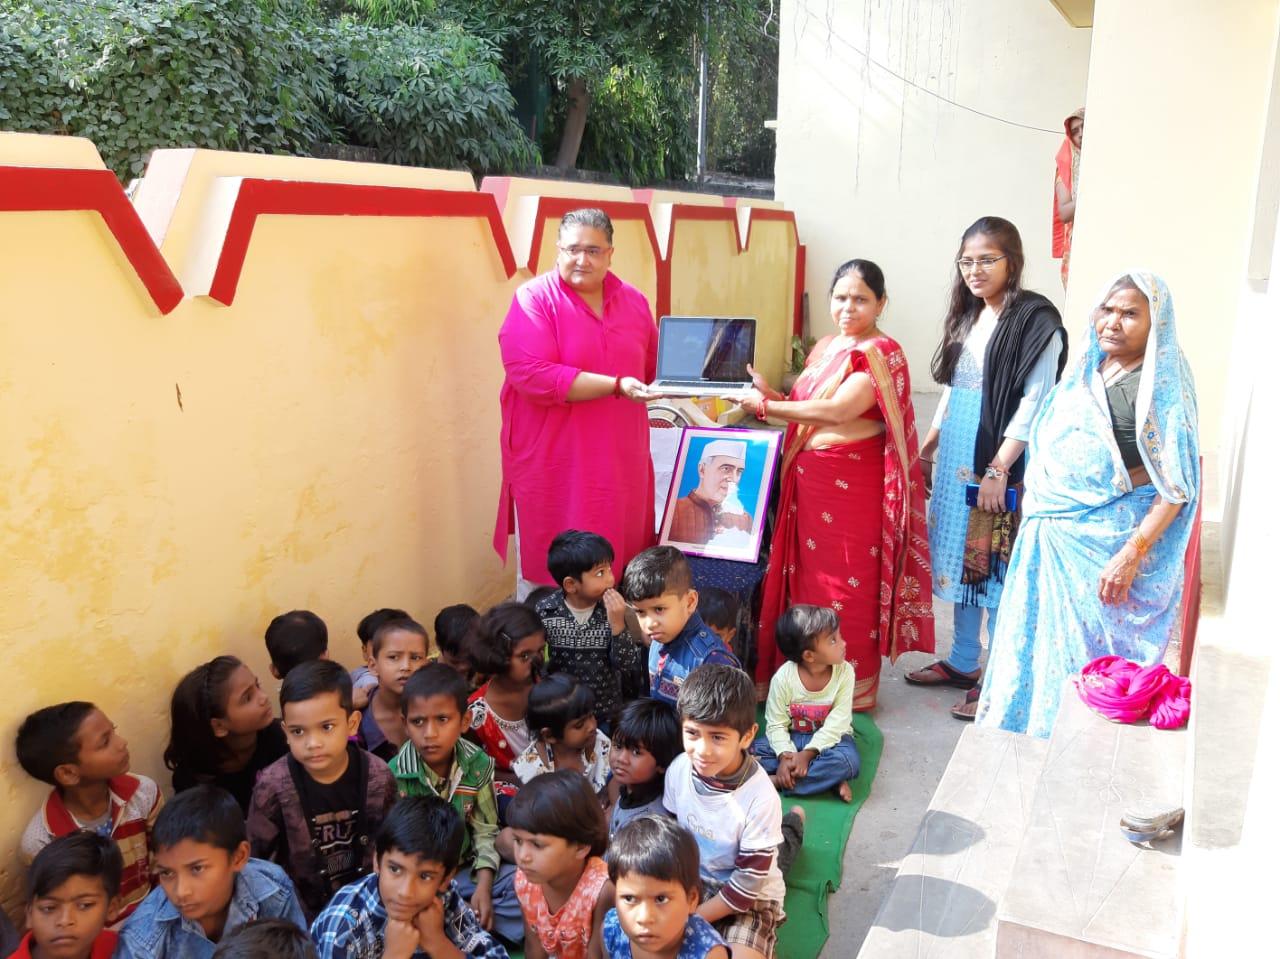 हिंदी समाचार | बच्चों को बाँटा लैपटॉप, मनाया...